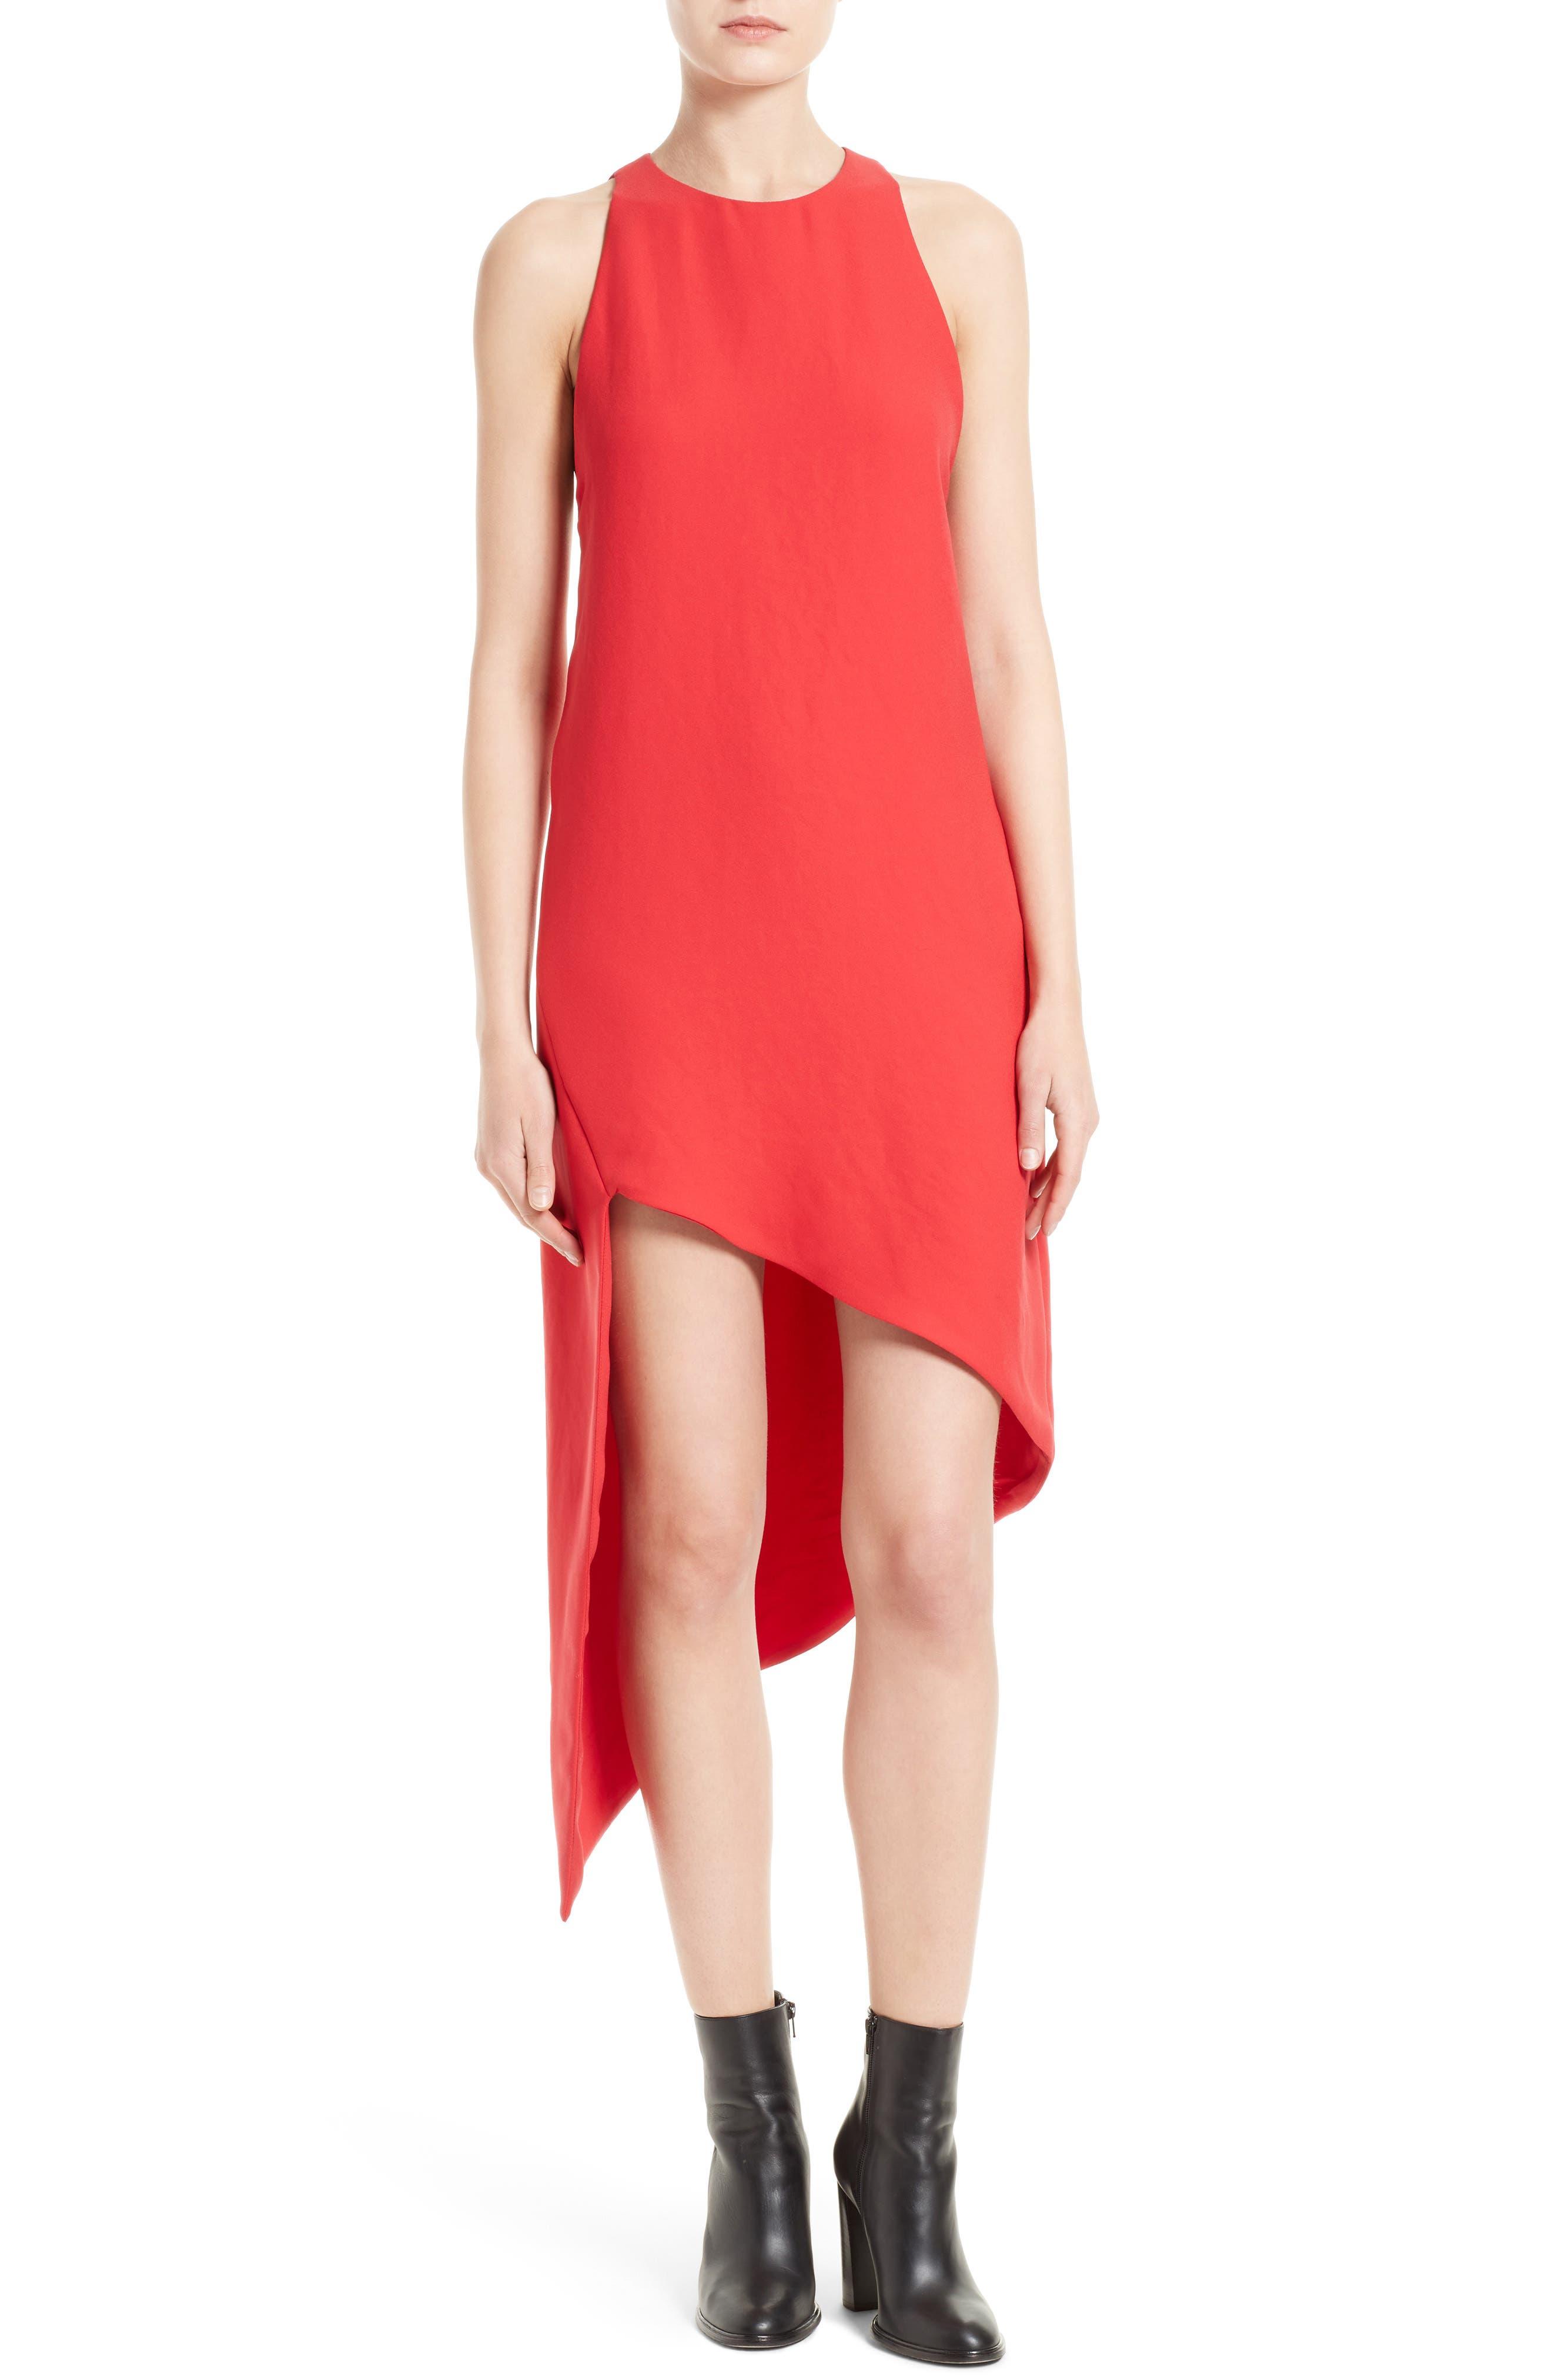 Alternate Image 1 Selected - IRO Hamlin Asymmetrical High/Low Dress